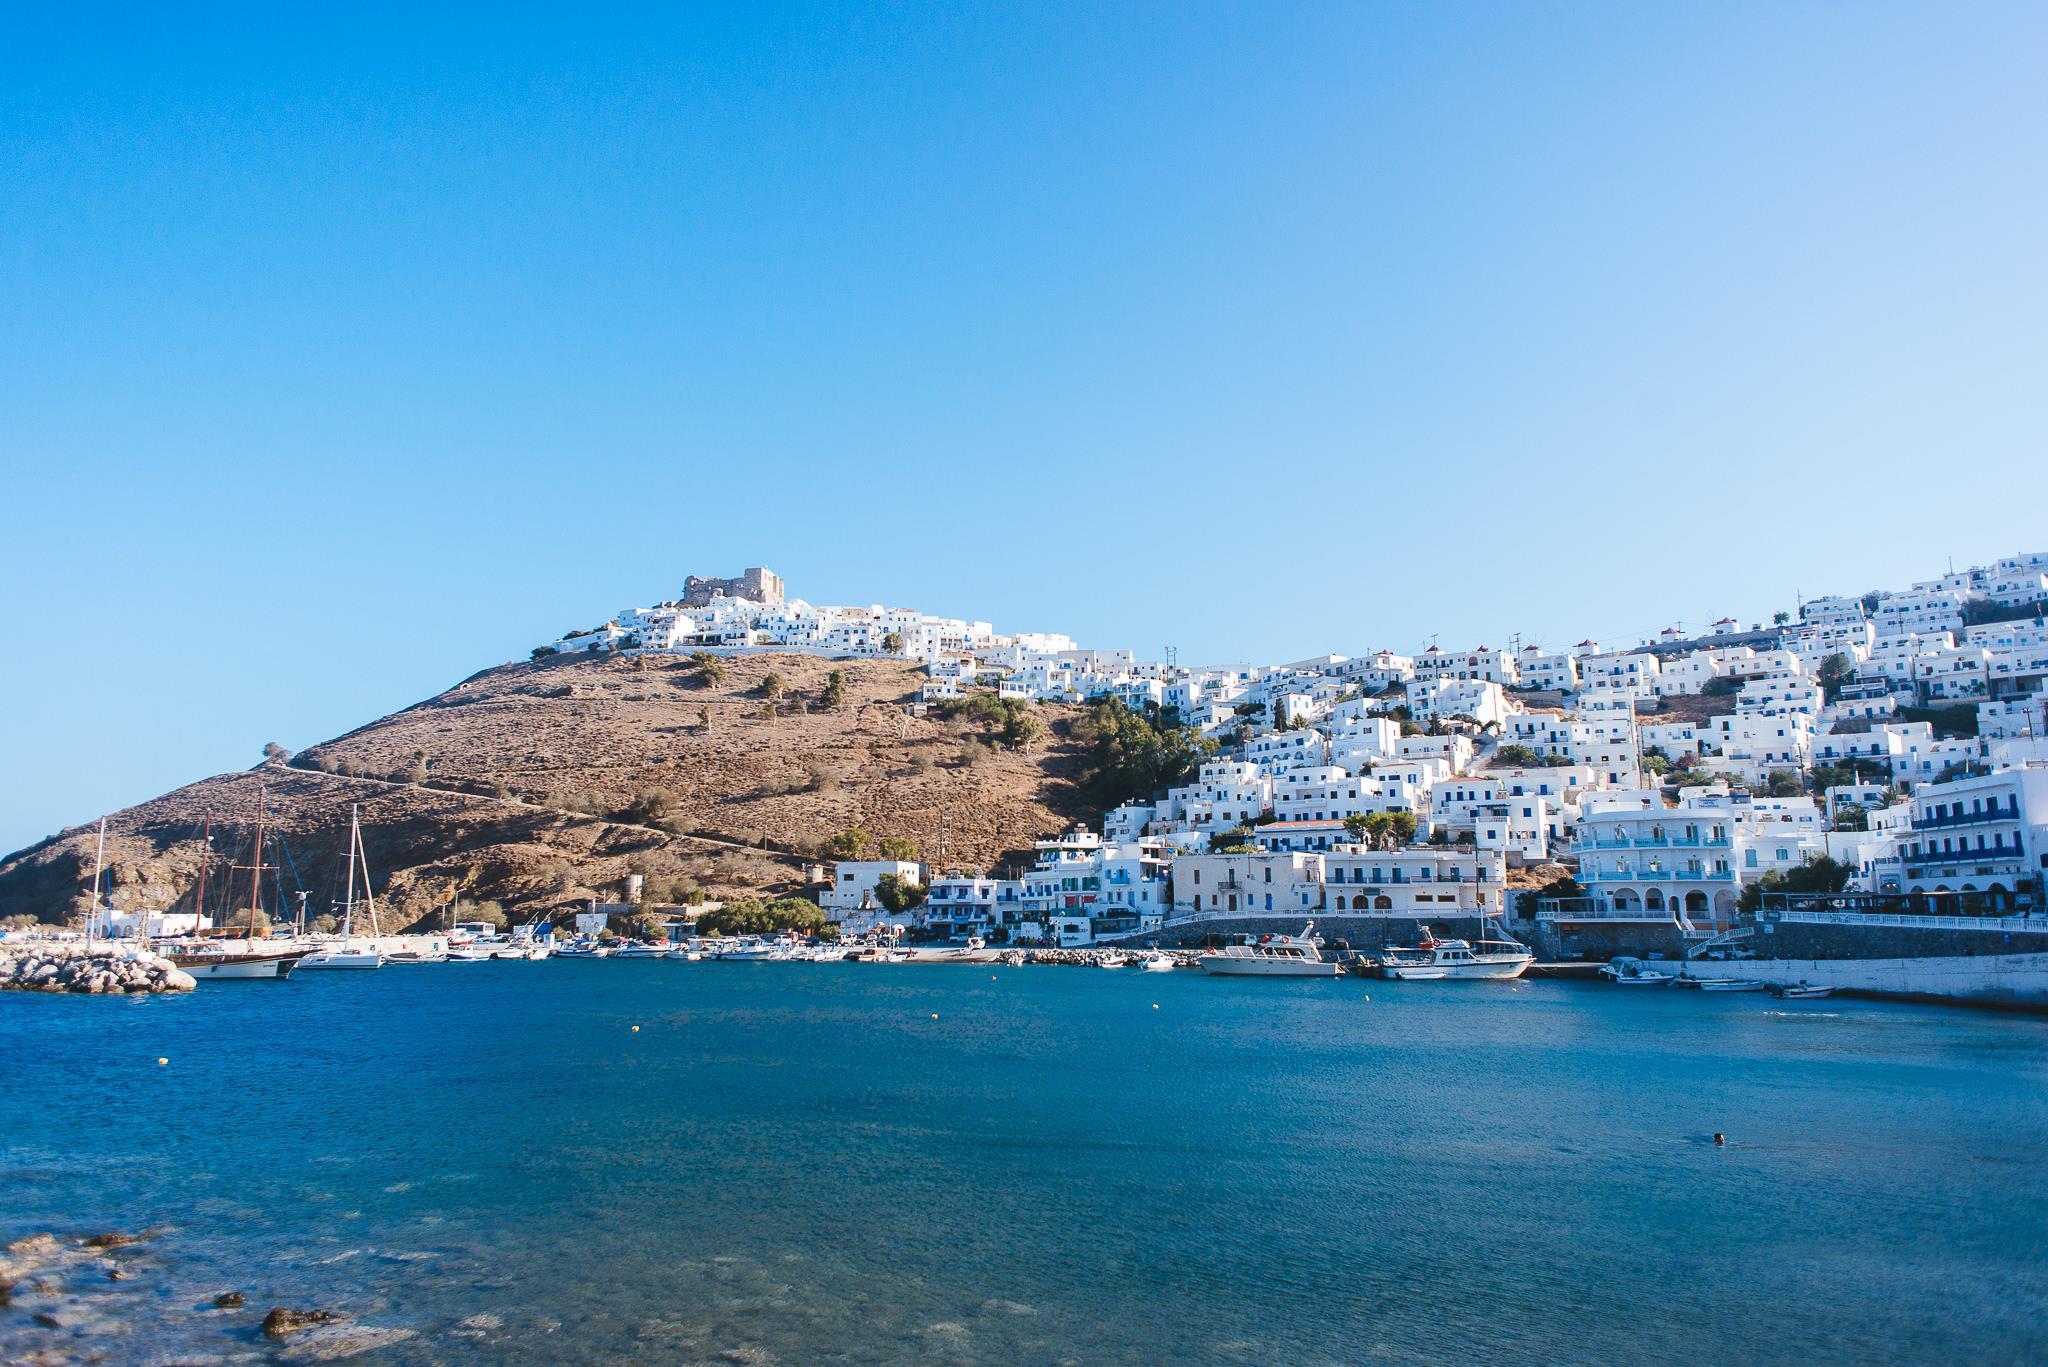 cdbe6308f877 Αυτό είναι το πρώτο ελληνικό νησί που λέει «όχι» στο τσιγάρο